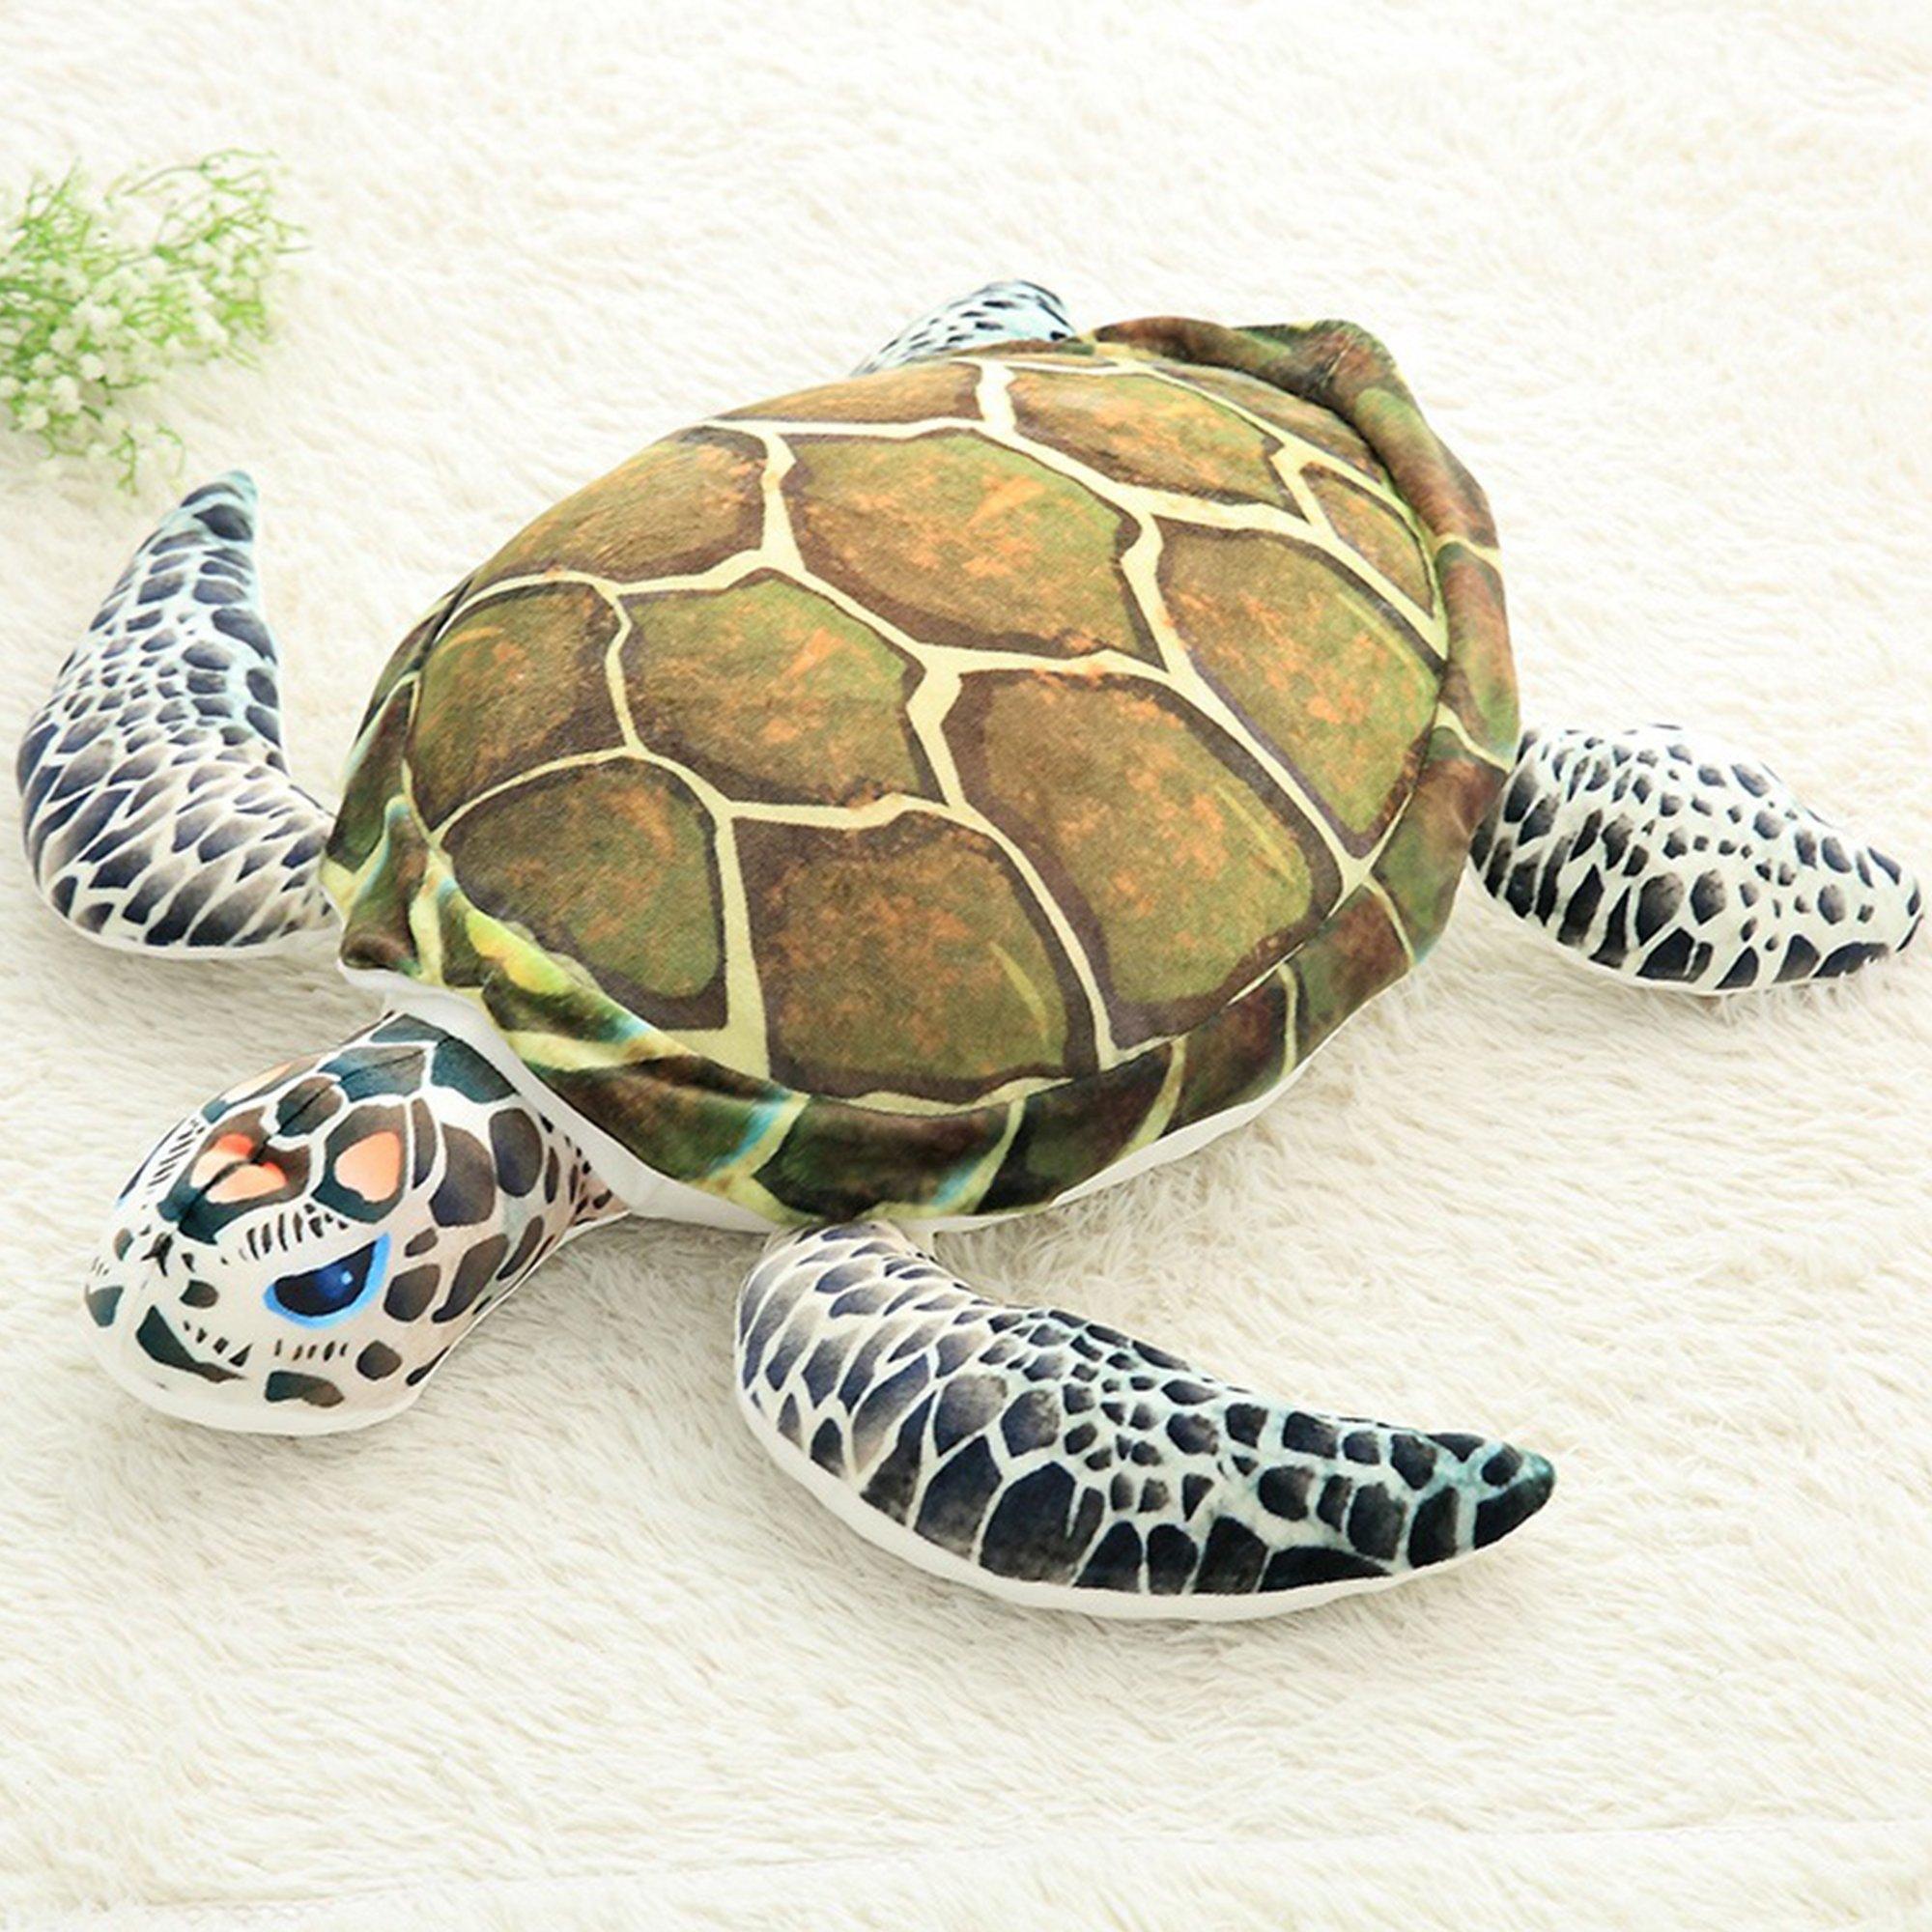 Lazada Ocean Plush Sea Turtles Stuffed Tortoise Toys Animal Pillow Gift Cushion 15''